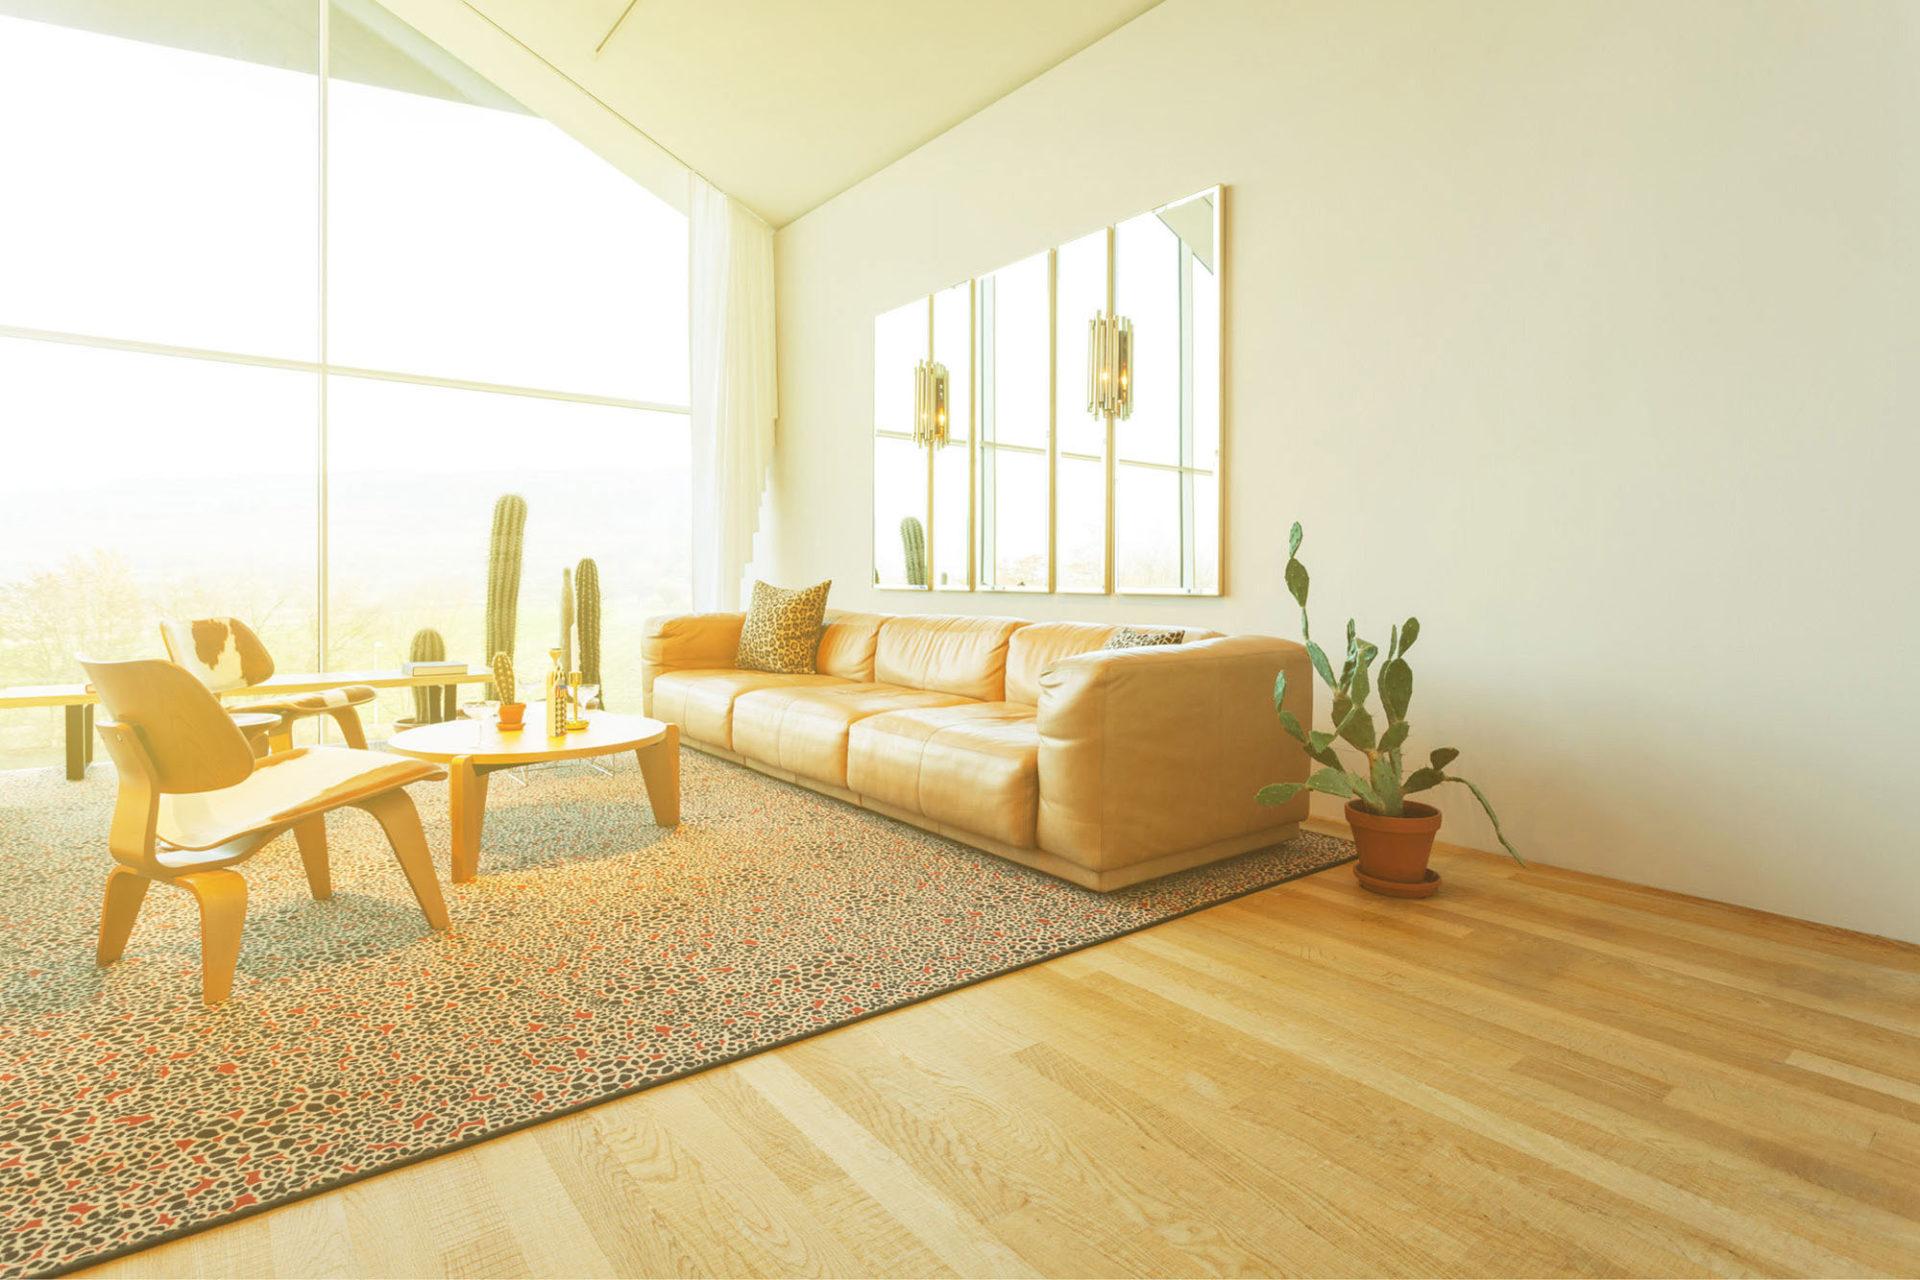 vitra-design-museum-henrik-schipper-fotodesign